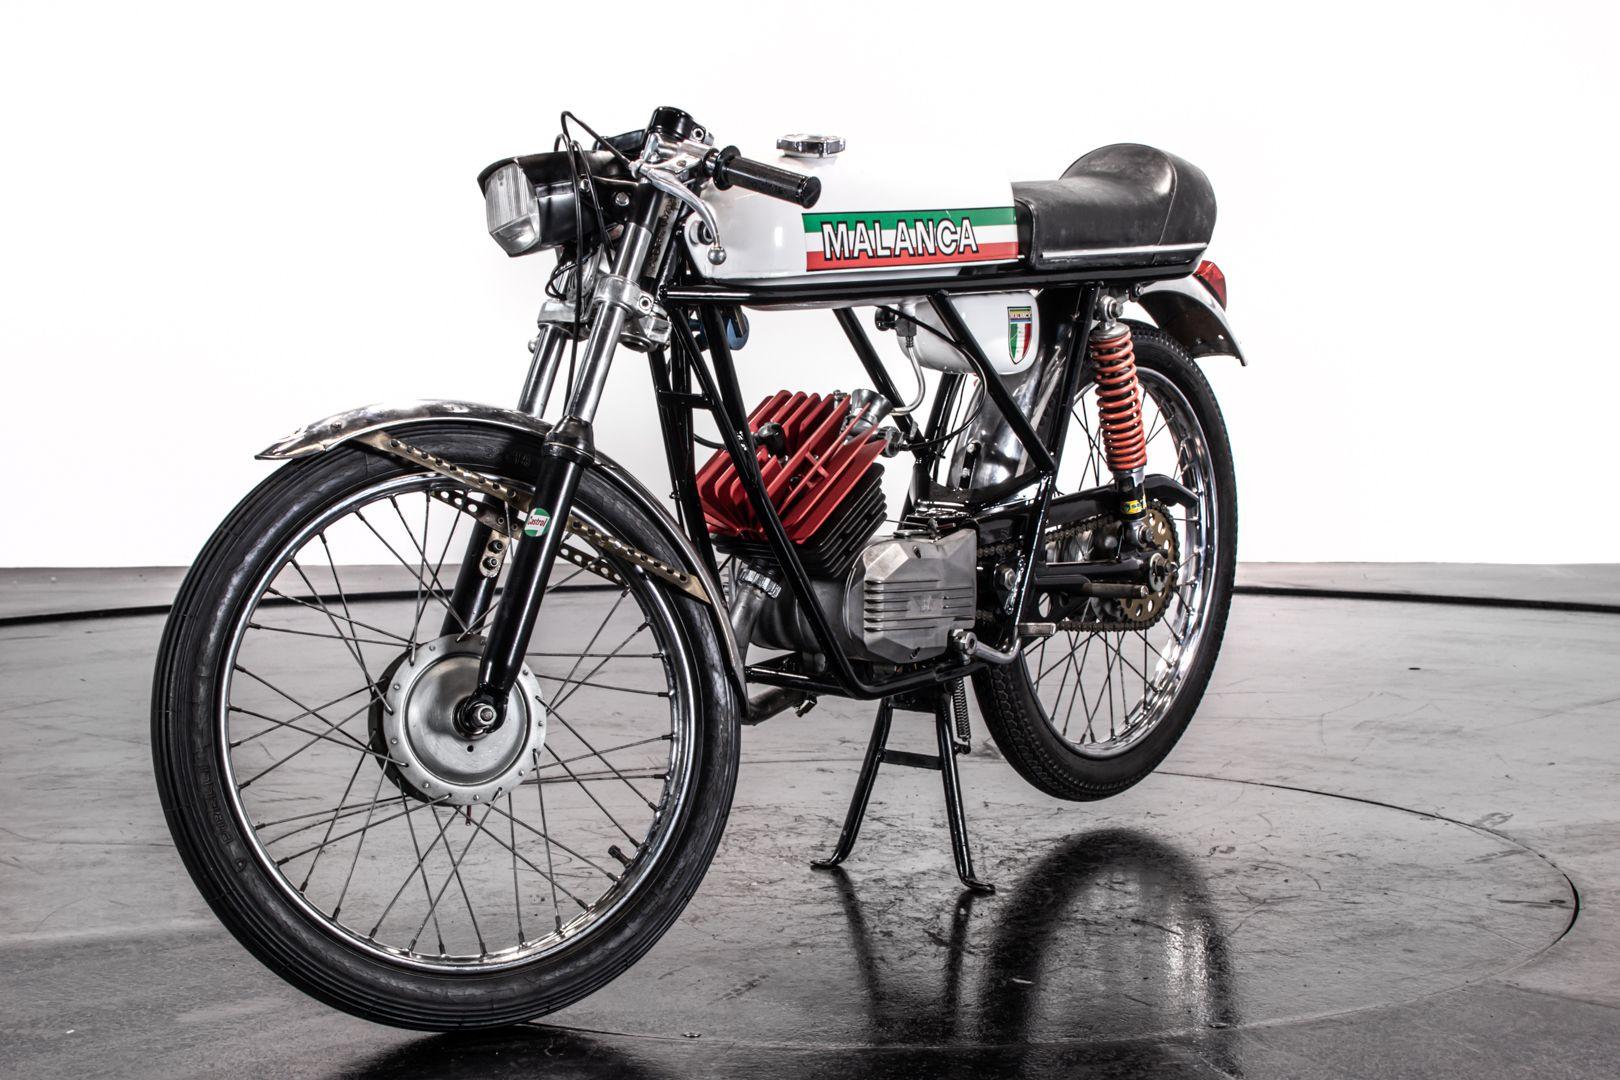 1973 Malanca Testarossa 68964